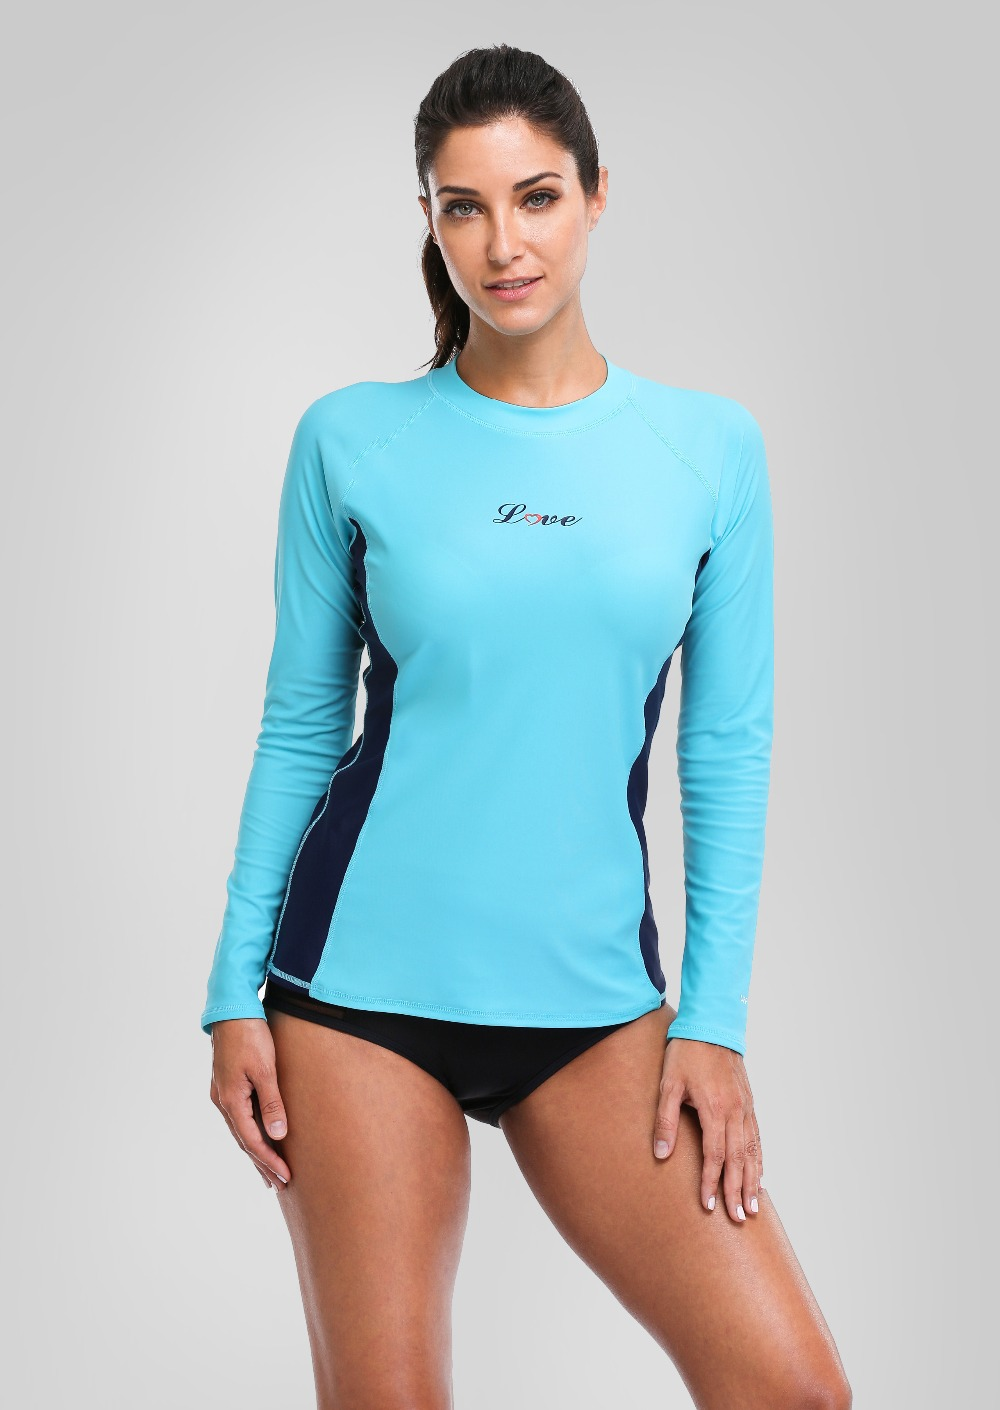 dc39e370b53 Charmleaks Women Rash Guards Swimwear Long Sleeve Rashguard Swim ...